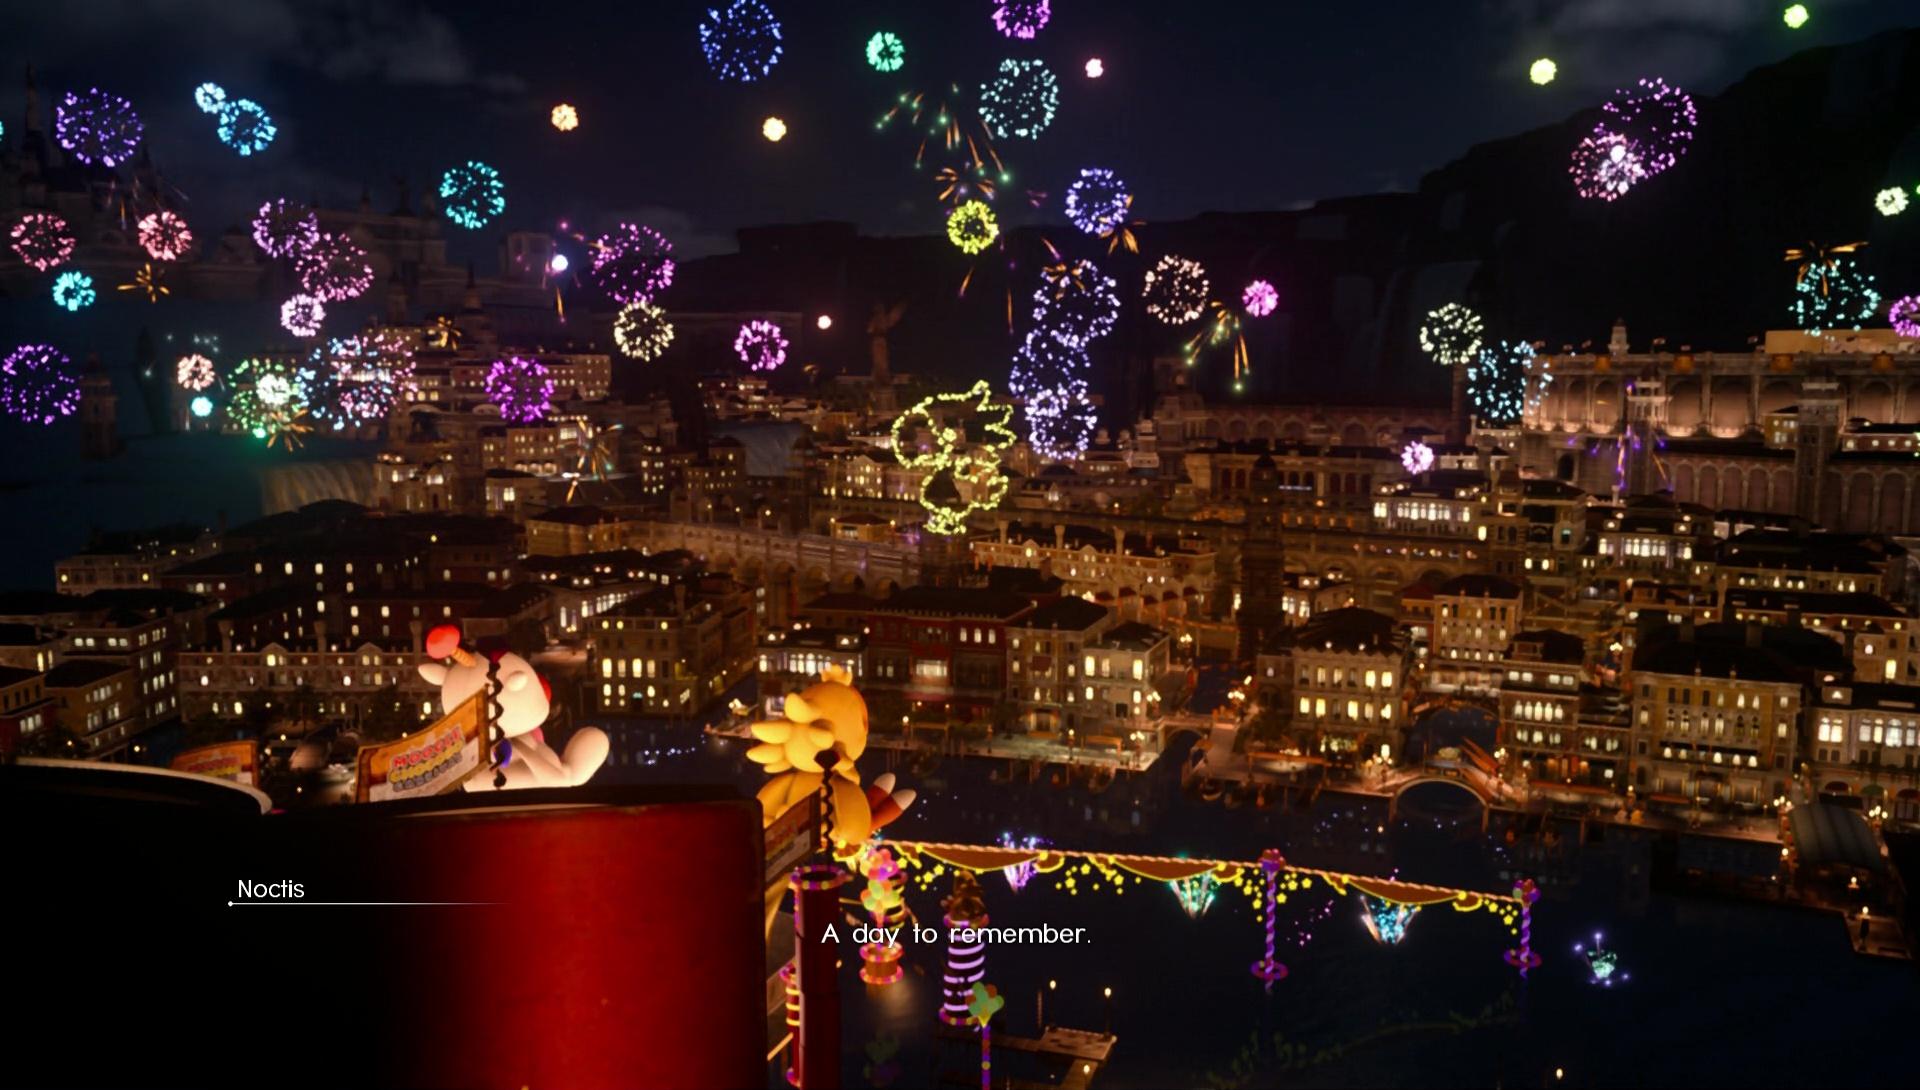 Wallpaper Destiny Hd Final Fantasy Xv Activities Moogle Chocobo Carnival